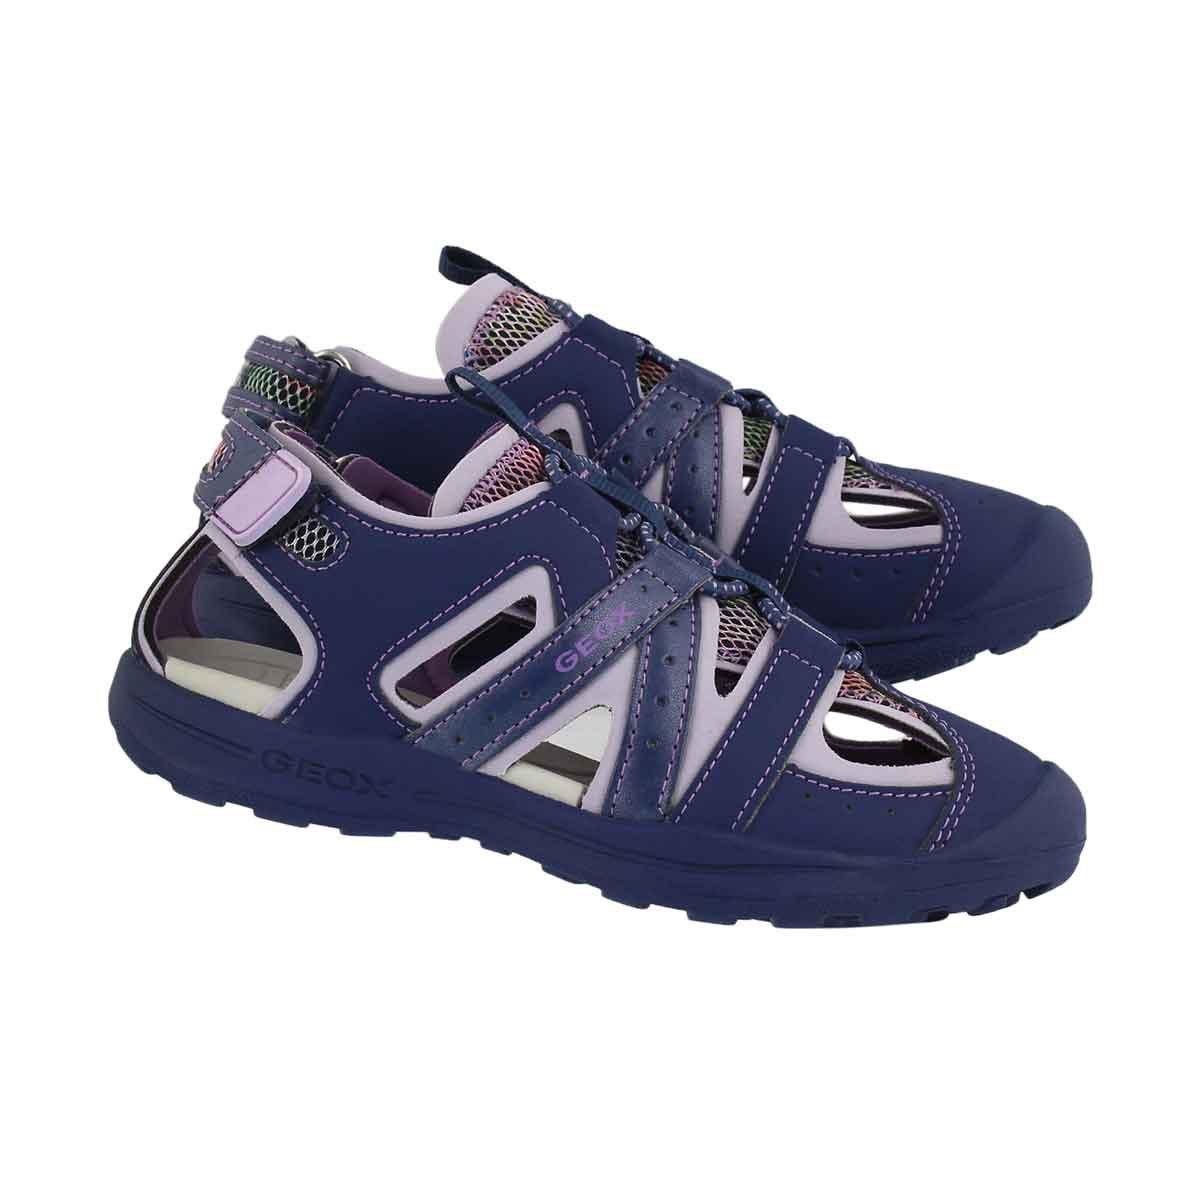 Grls Vaniett nvy/lilac fisherman sandal